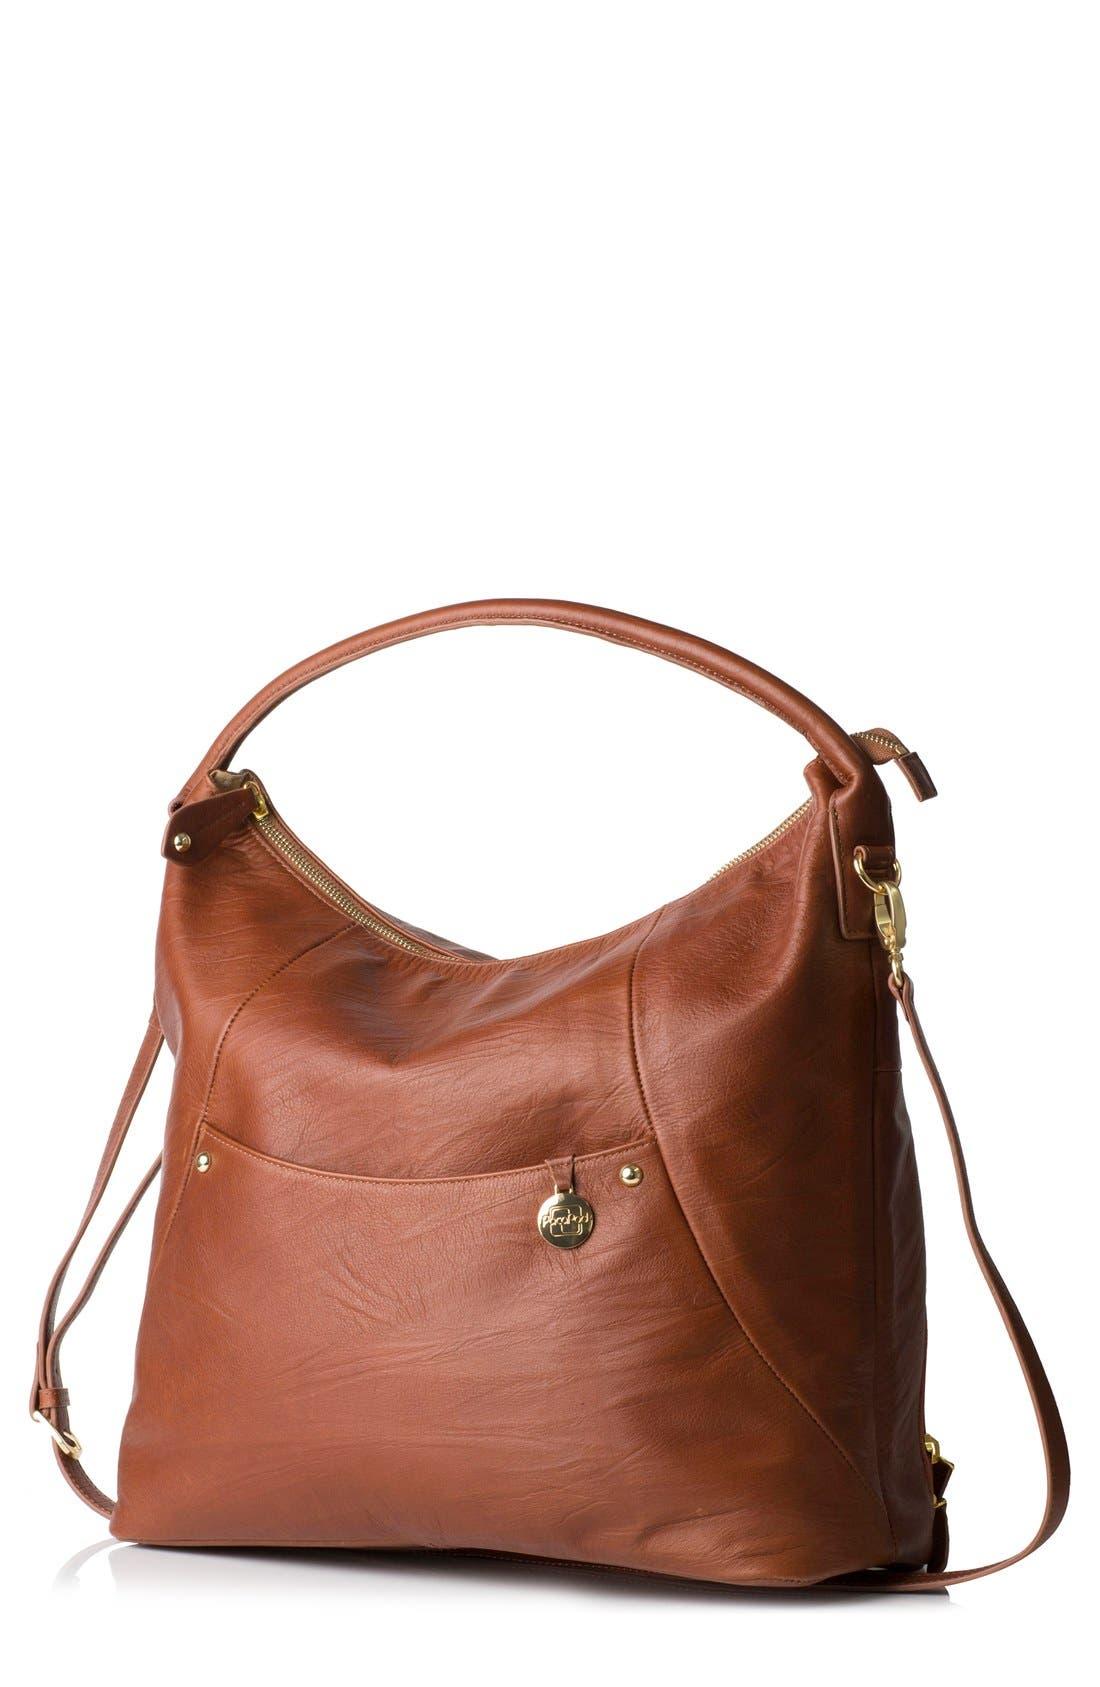 Main Image - PacaPod 'Jasper' Leather Diaper Bag